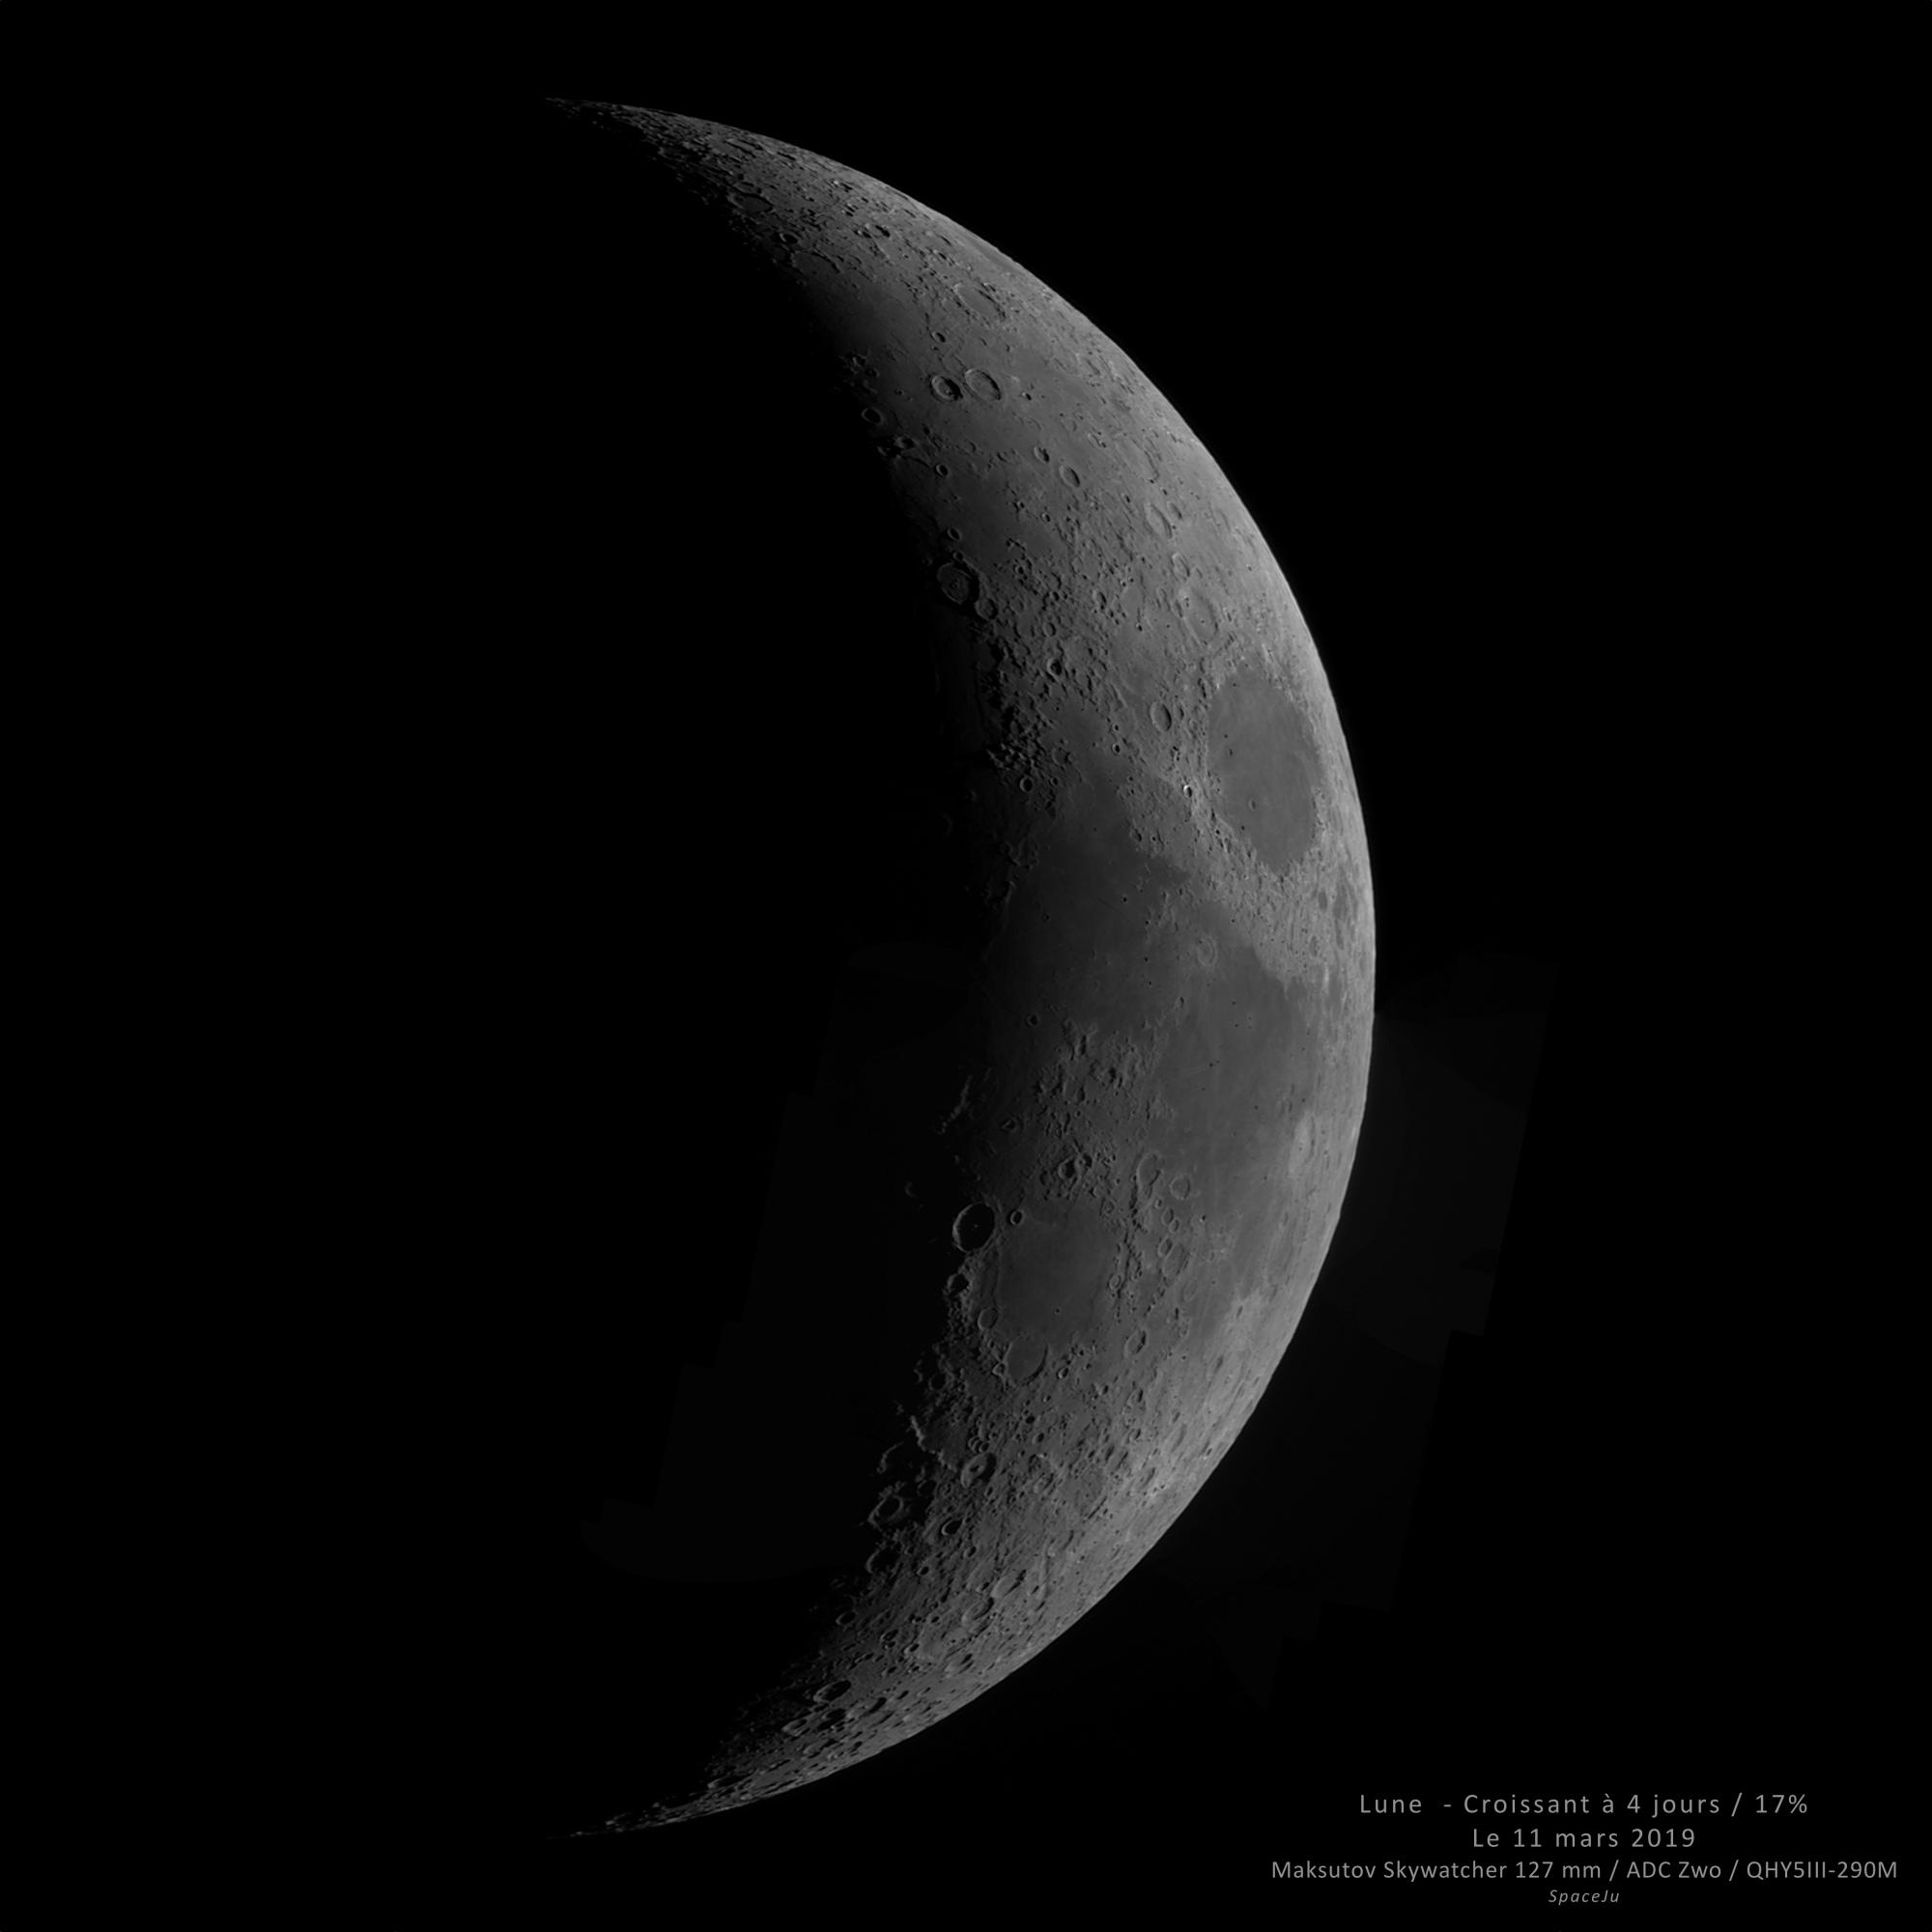 5c86d62933626_20190311-Lune.thumb.jpg.ab2b41fe16b4af2dc4b196cfe54e887a.jpg